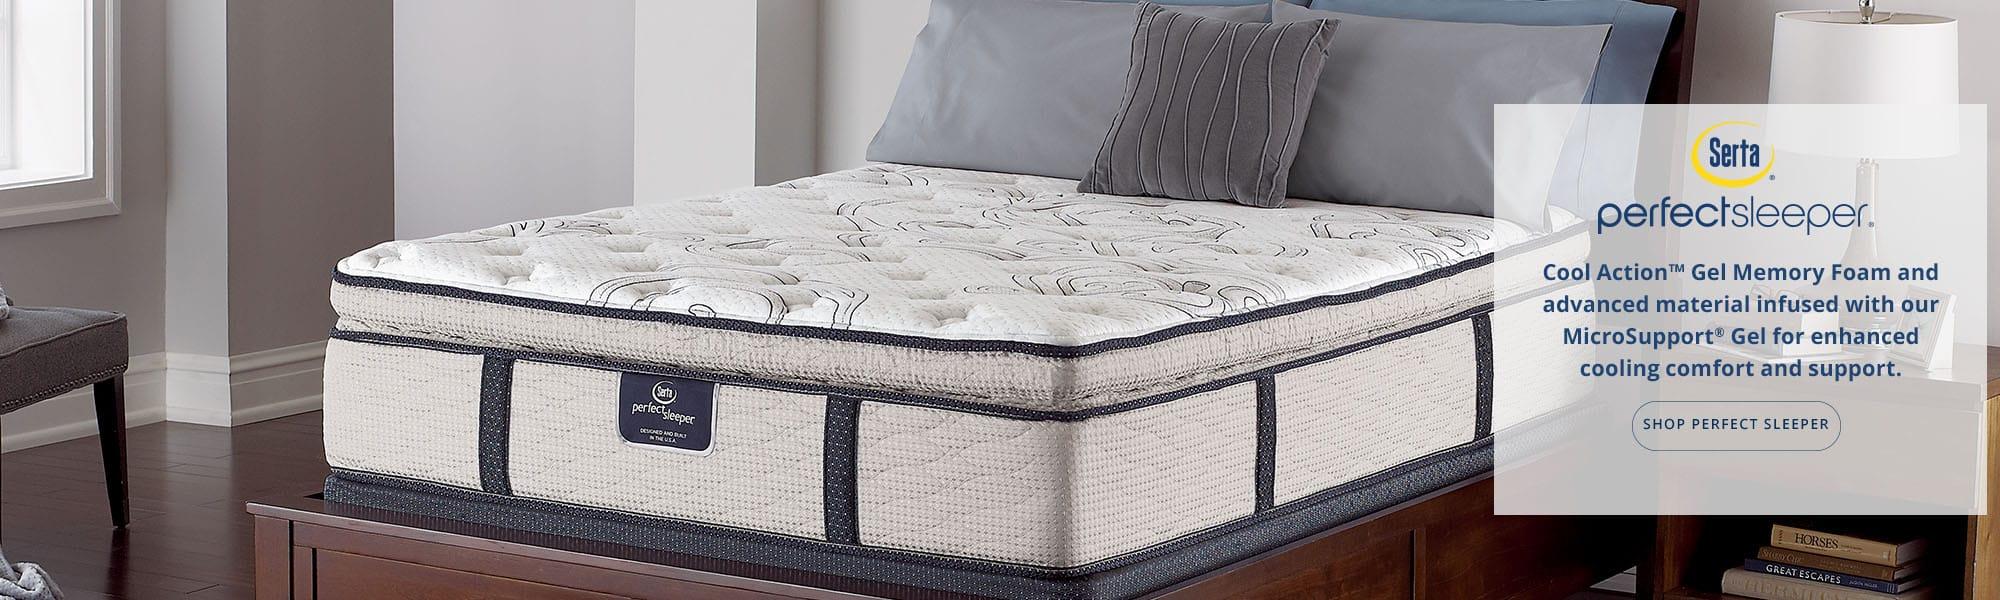 Serta mattresses